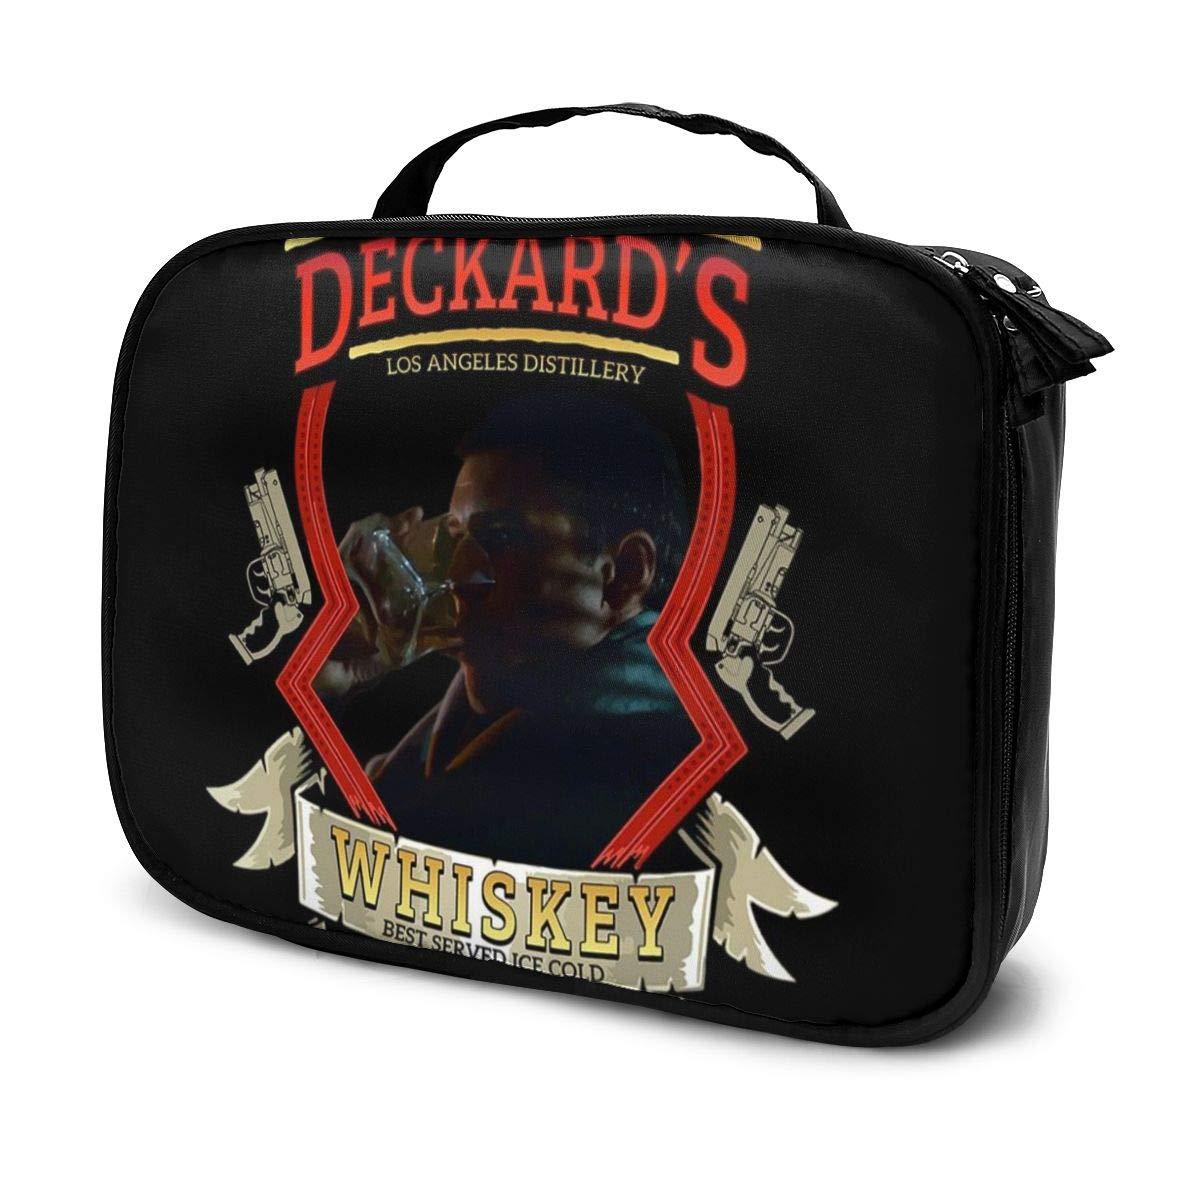 Makeup Bag Cosmetic Pouch Rick Deckards Single Malt Whiskey Blade Runner Multi-Functional Bag Travel Kit